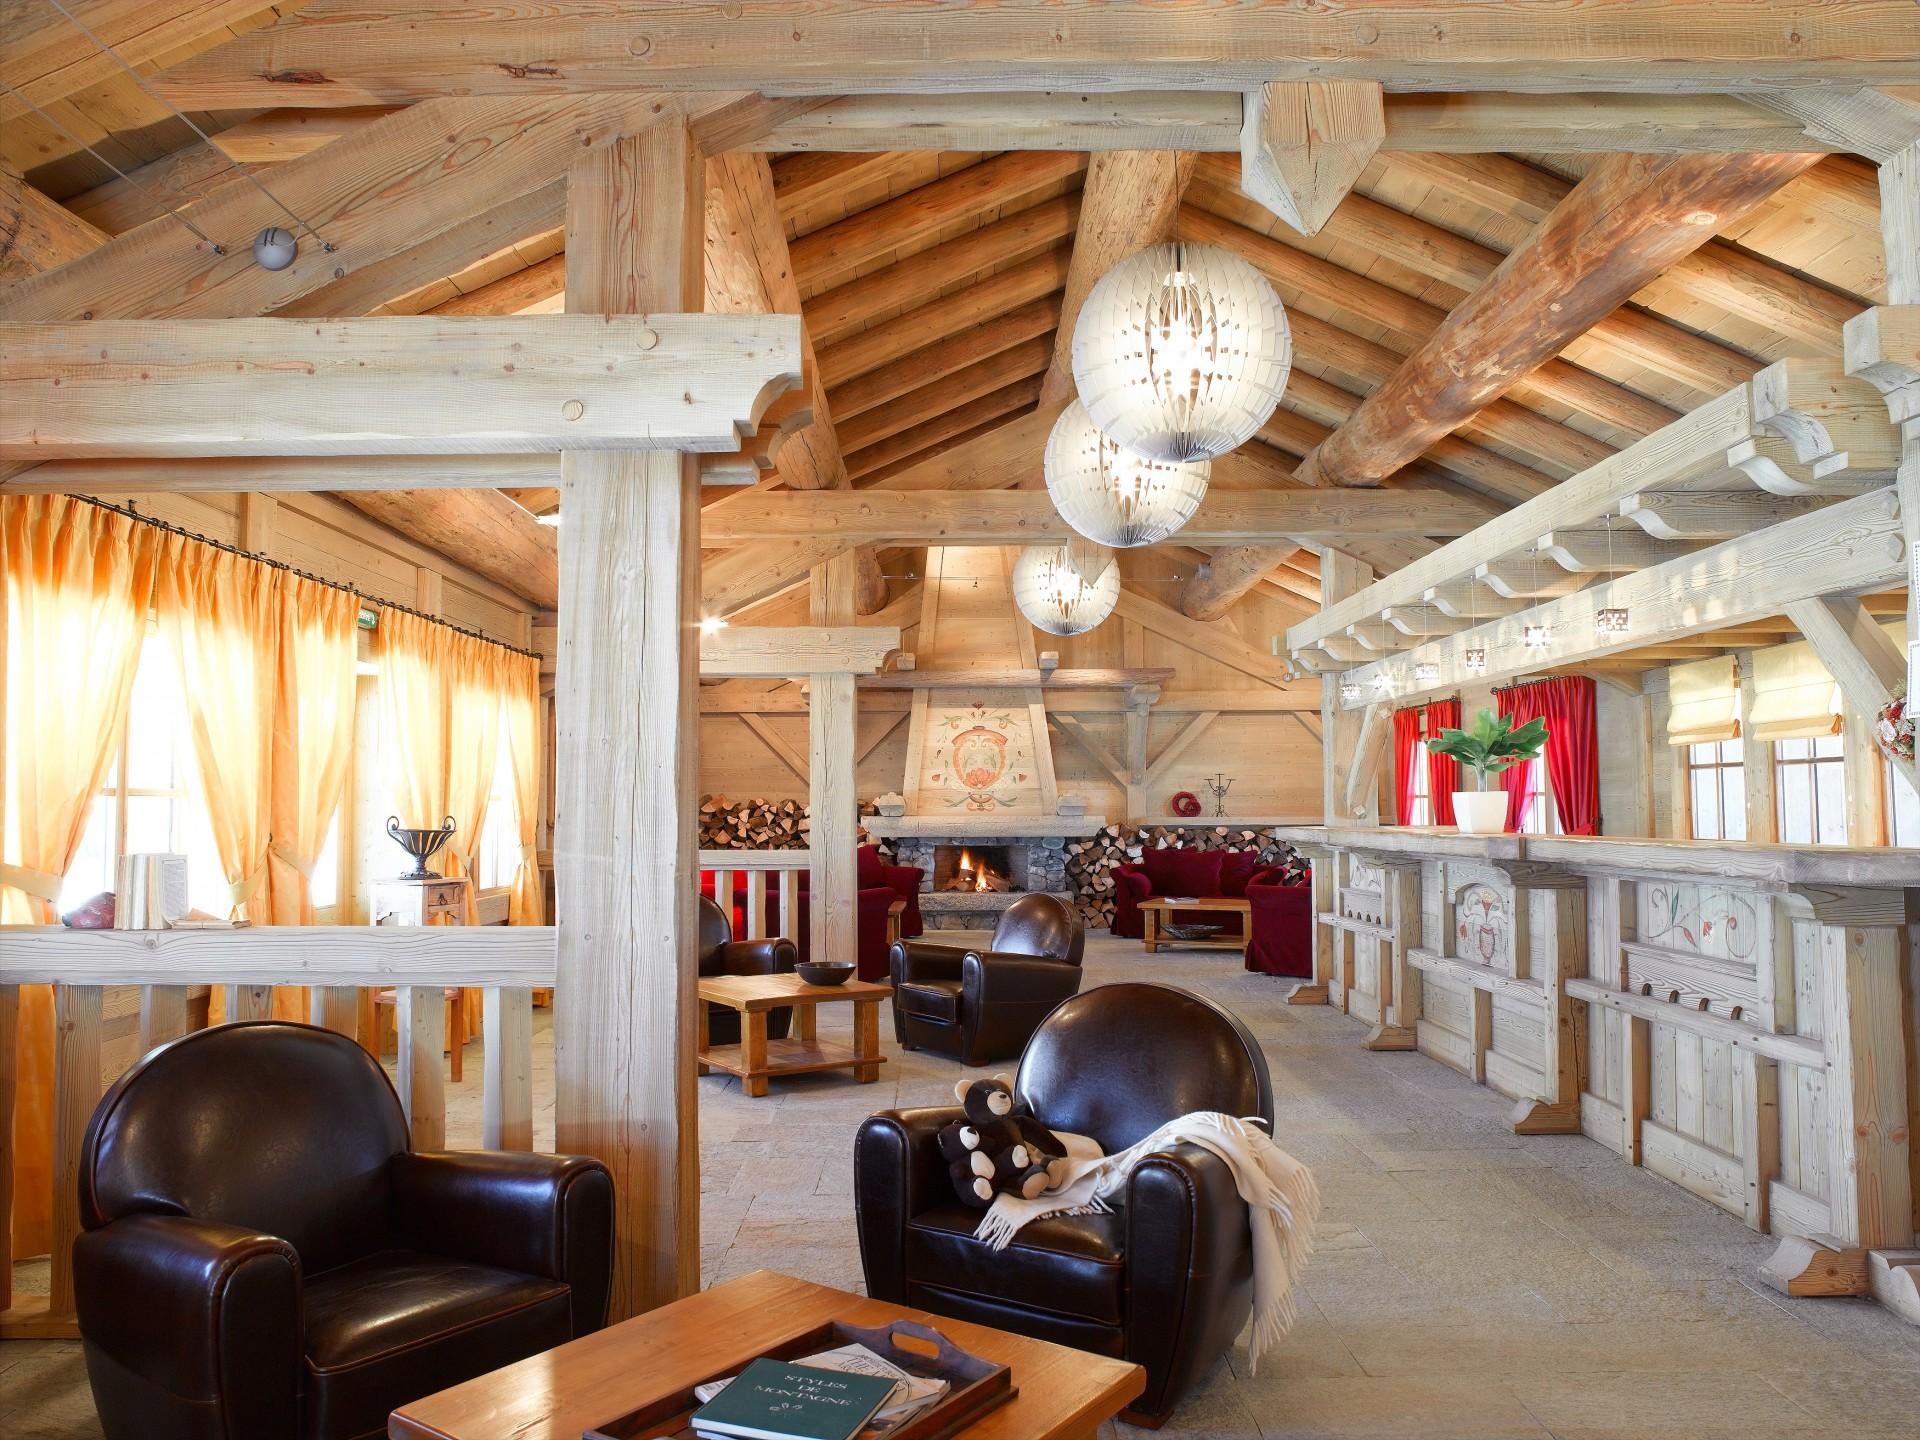 Les Saisies Location Appartement Luxe Leberstein Réception